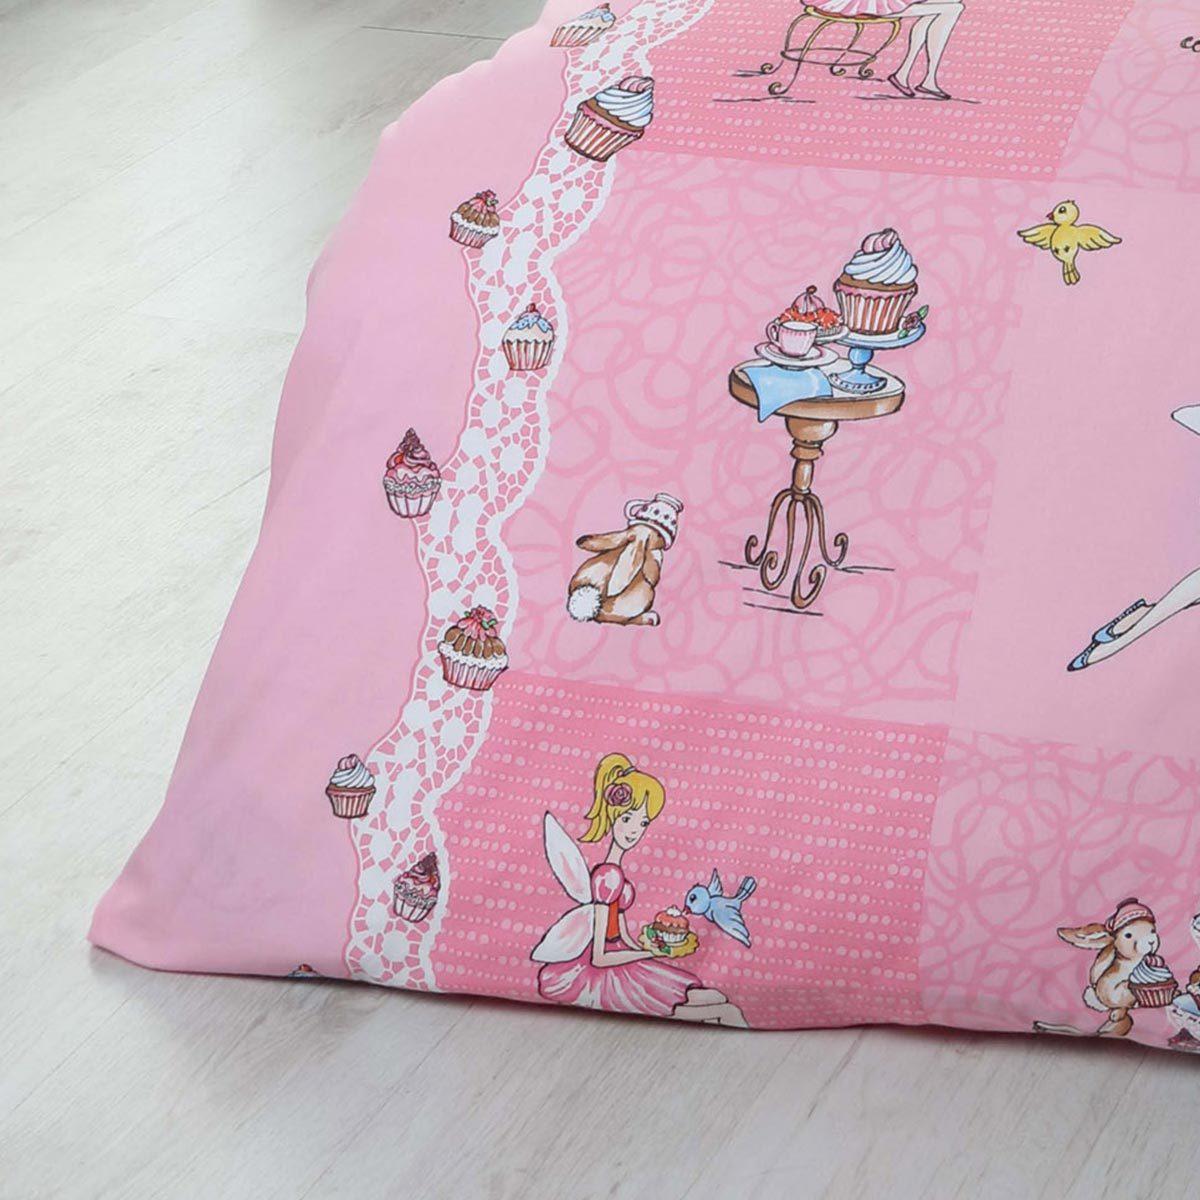 kaeppel biber kinderbettw sche cupcake rosa g nstig online kaufen bei bettwaren shop. Black Bedroom Furniture Sets. Home Design Ideas